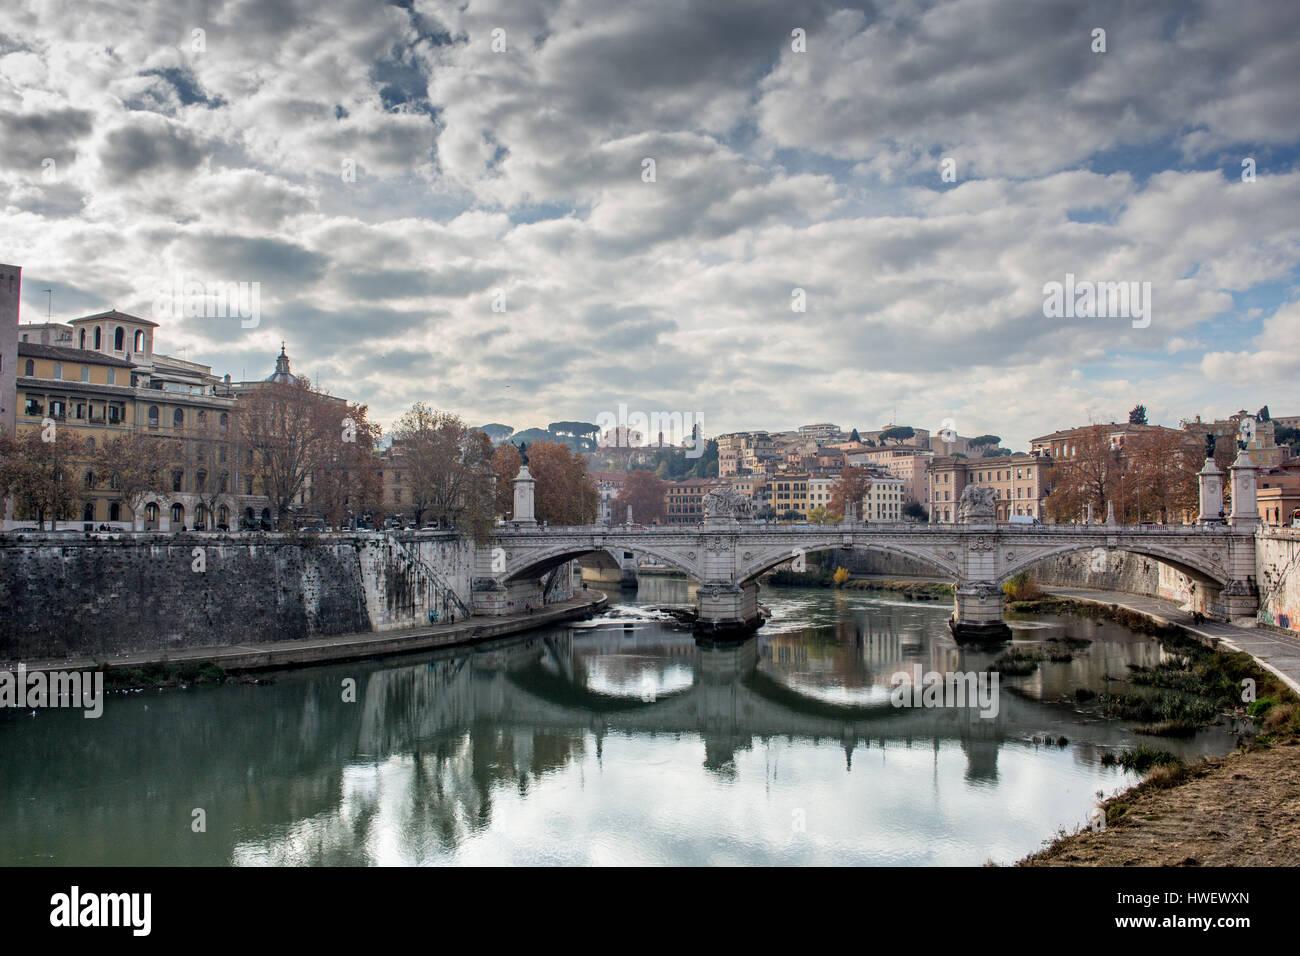 Engelsbrücke Rom Stock Photo